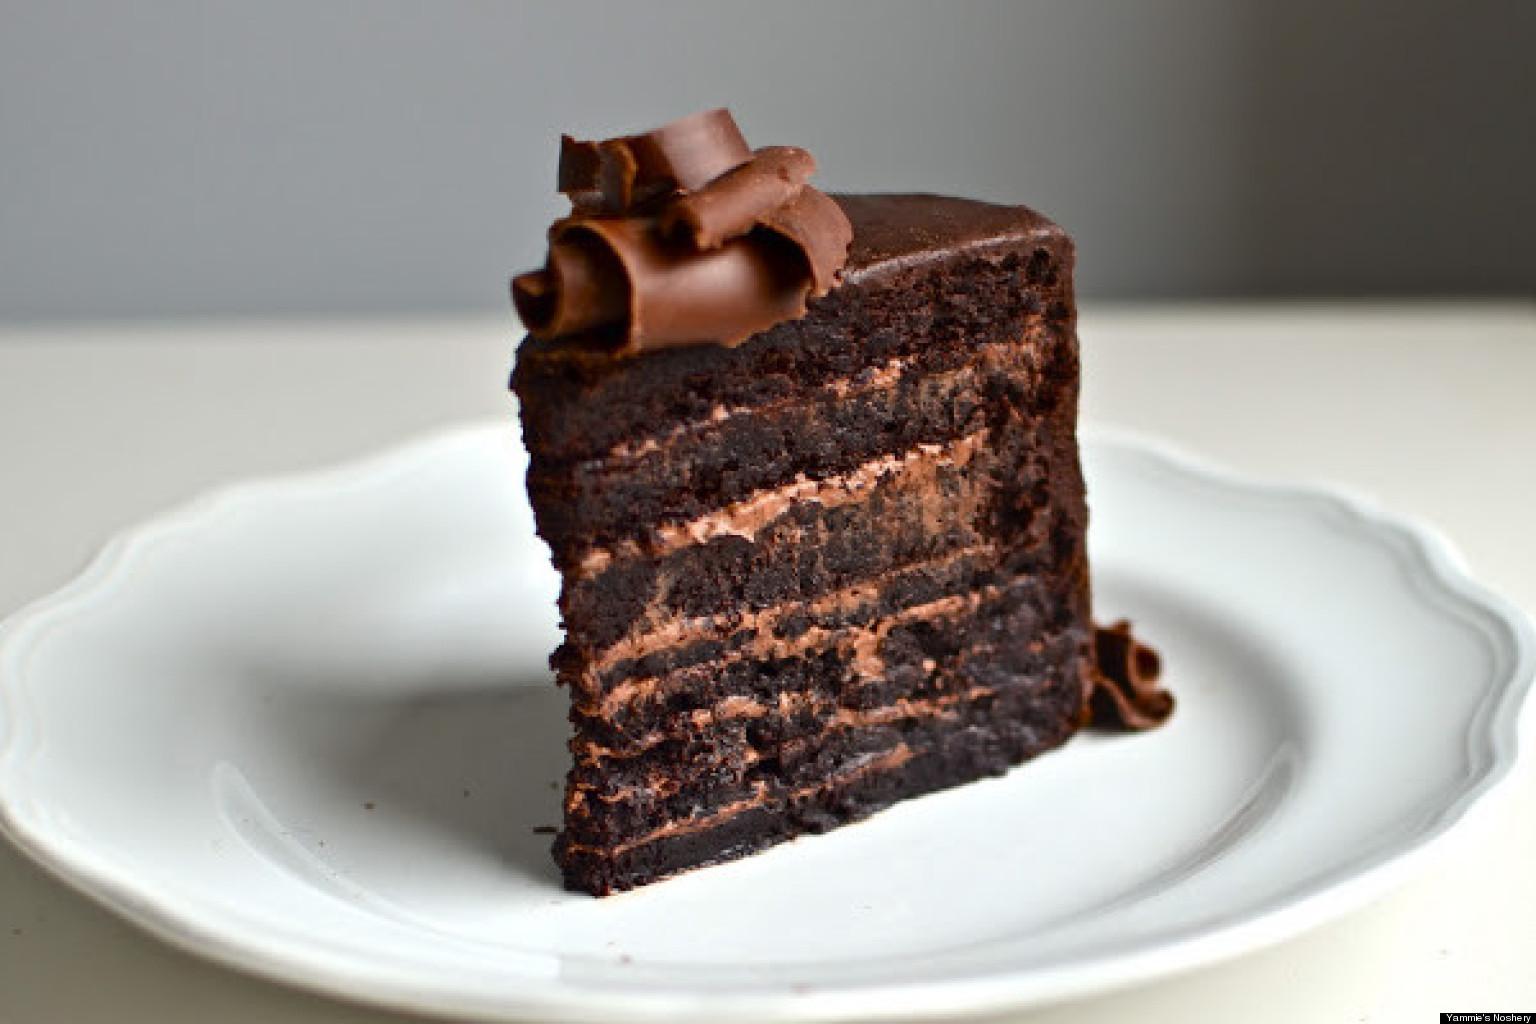 Chocolate Cake With Creme Fraiche